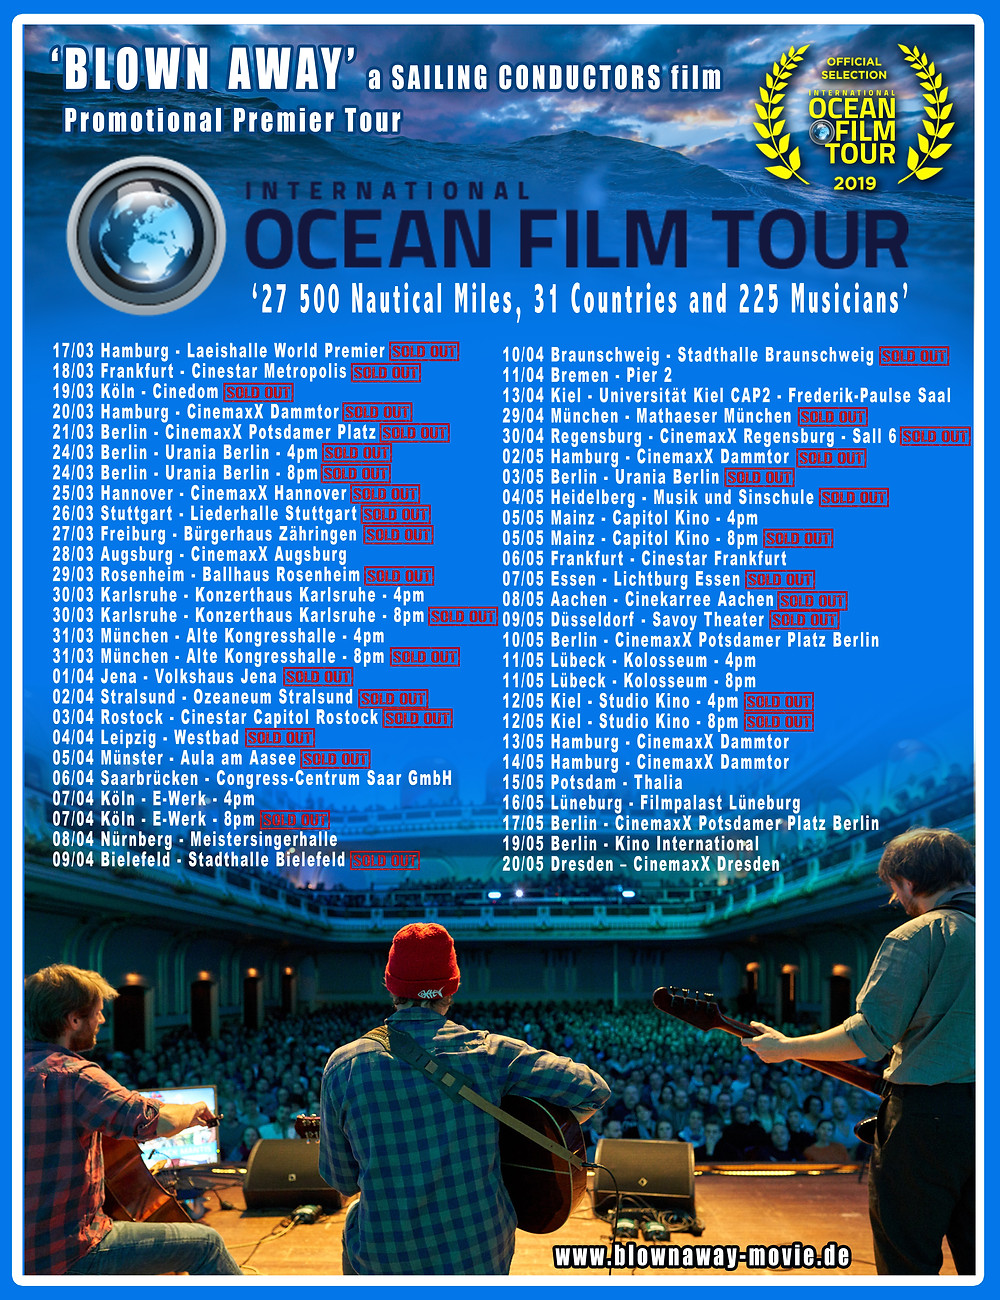 52 shows announced across the German landscape. Tickets @ https://de.oceanfilmtour.com/de/tickets